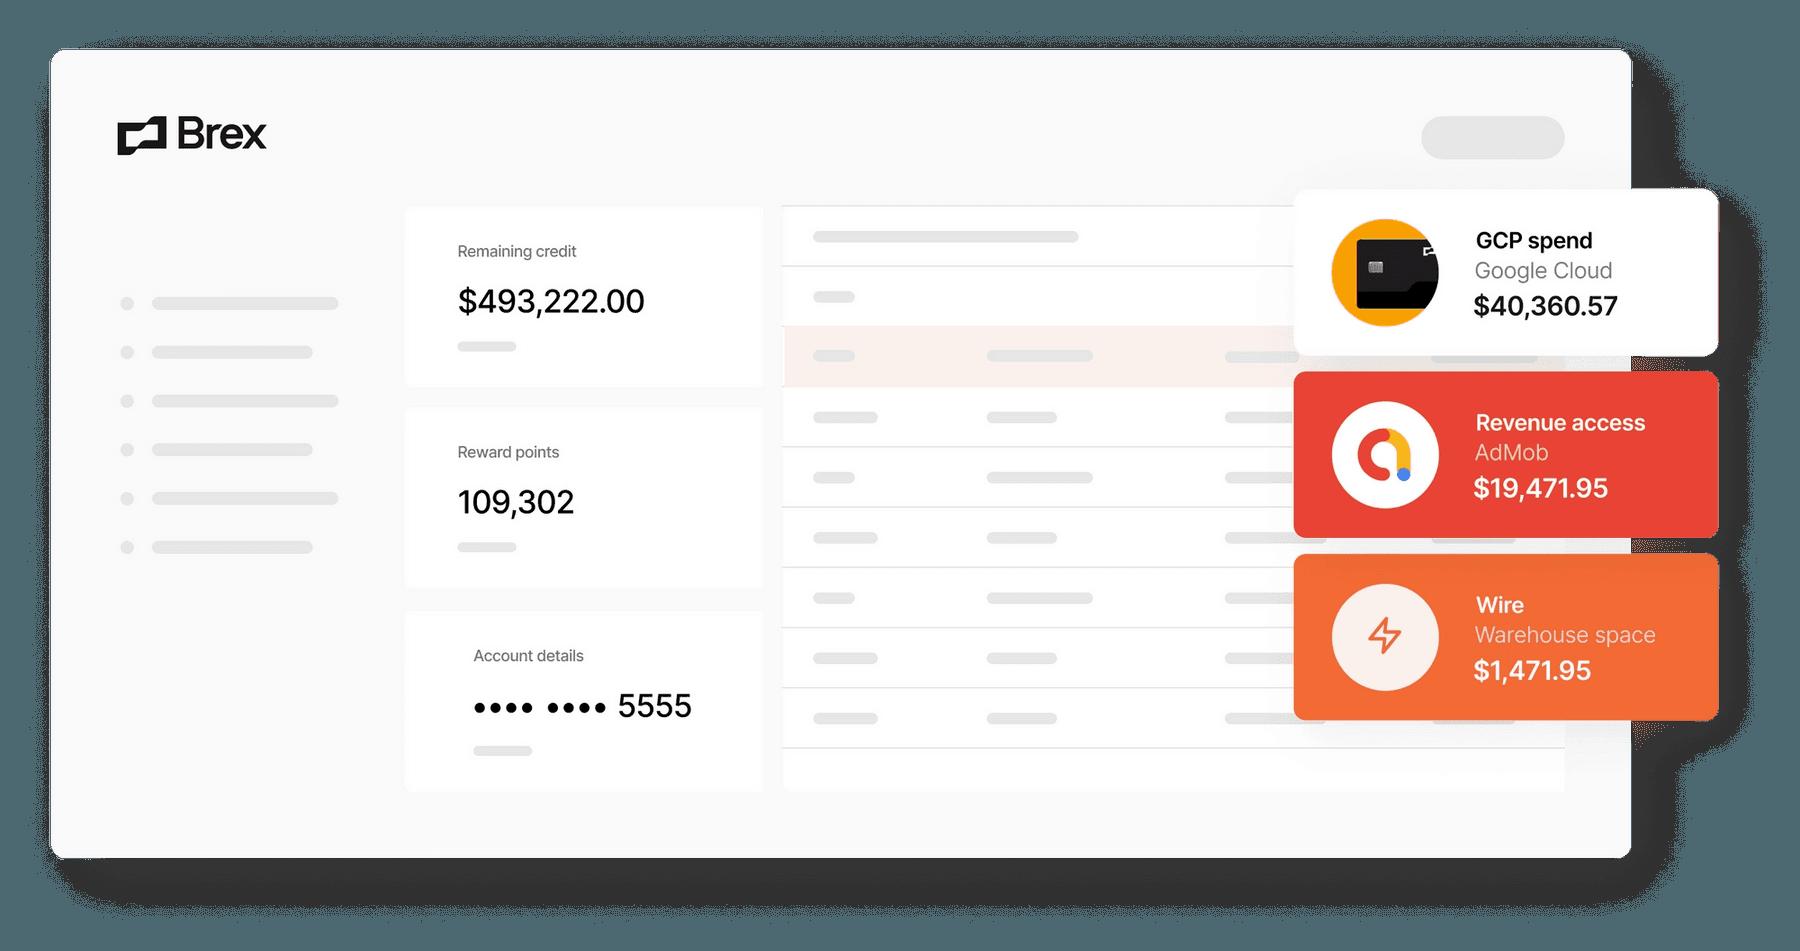 Revenue access with AdMob